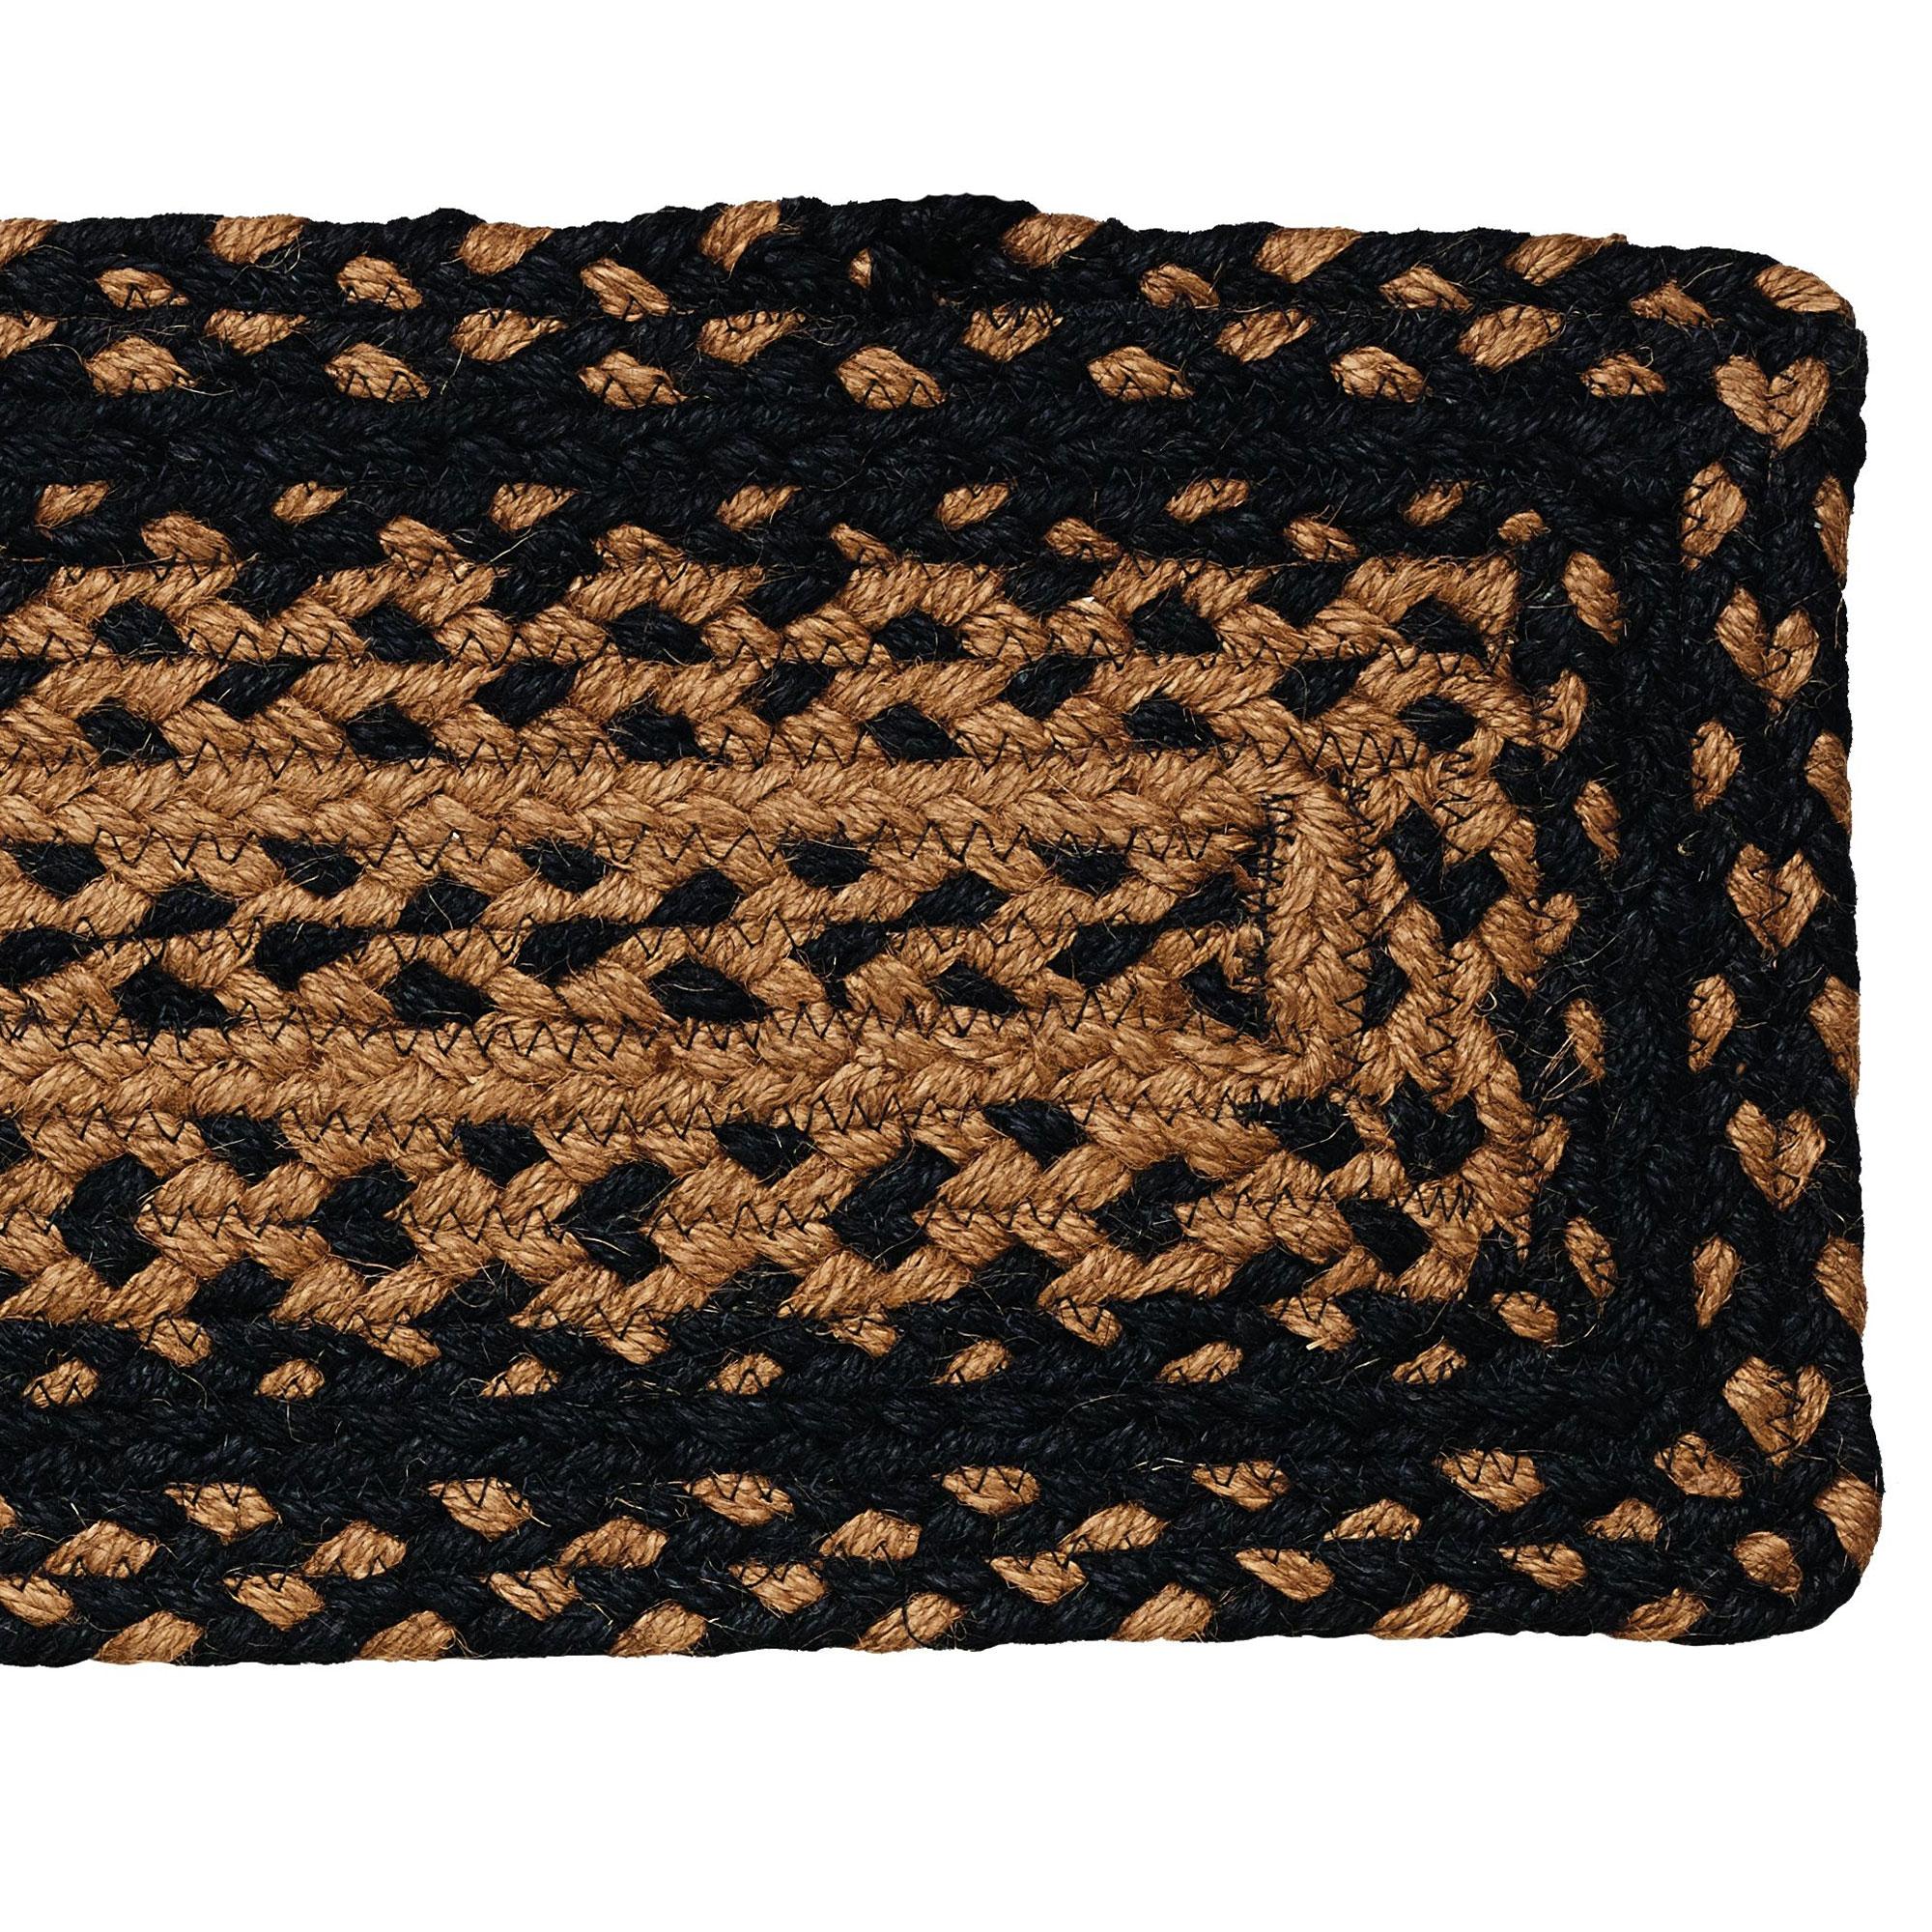 Braided Stair Treads 8×28 Set Of 13 Black Tan Rectangle Ebay For Rectangular Stair Treads (#1 of 20)